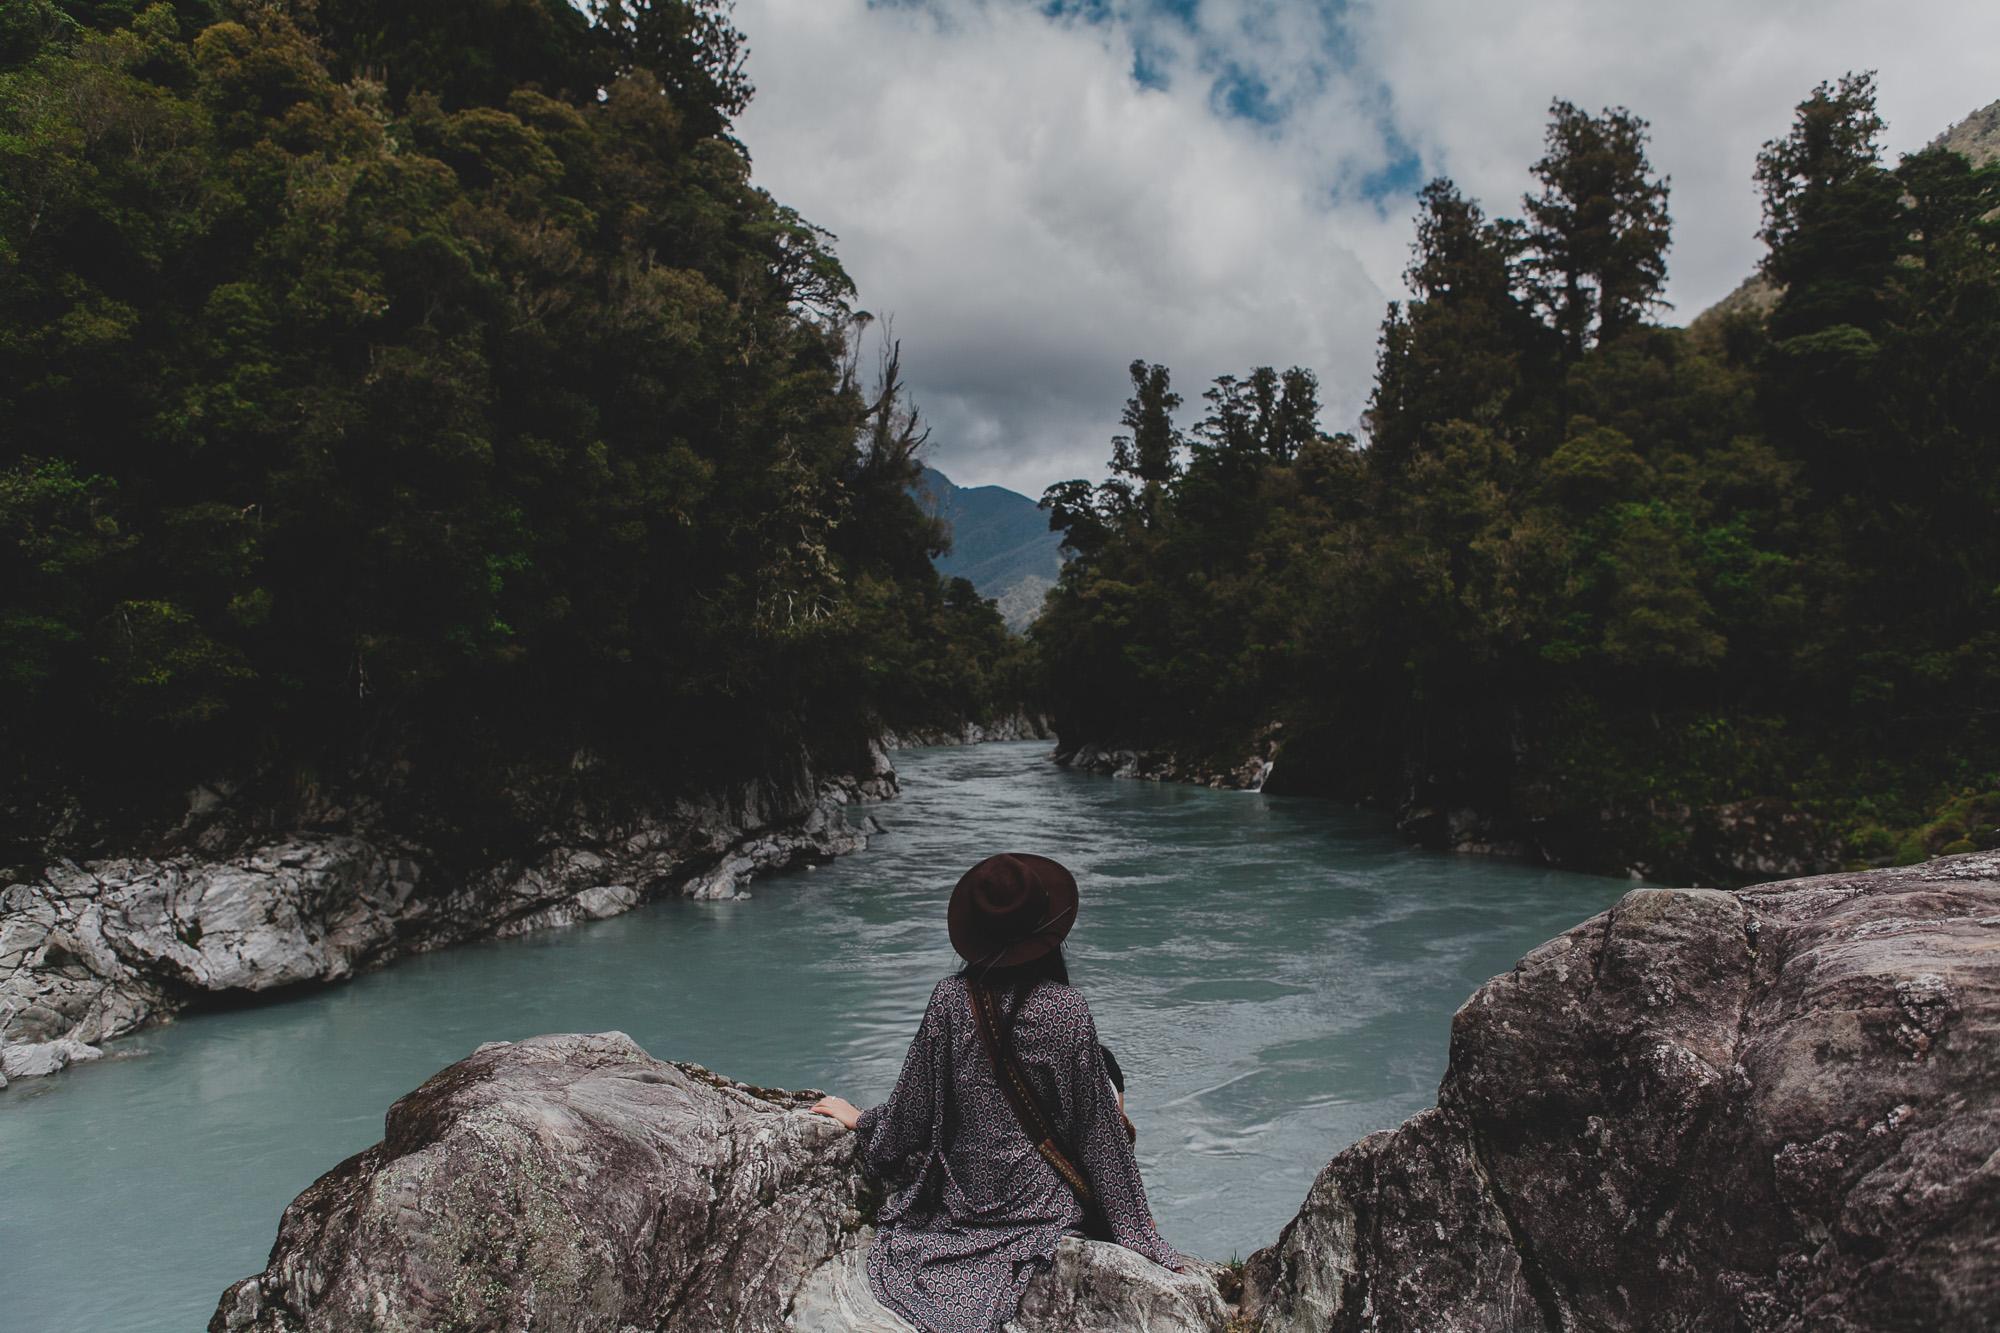 hokitika-gorge-new-zealand-travel-diary-jysla-kay-006